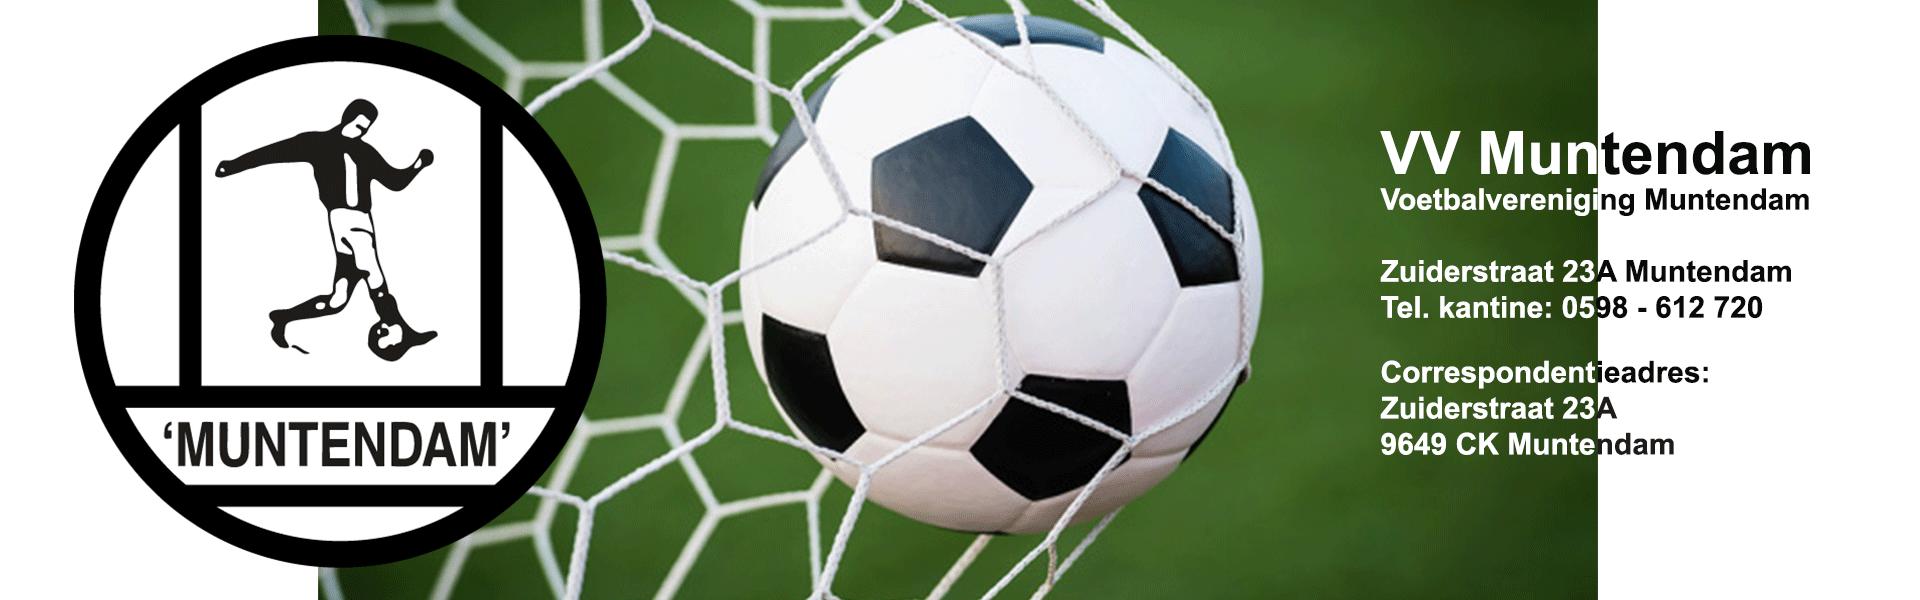 VV MUNTENDAM voetbalvereniging